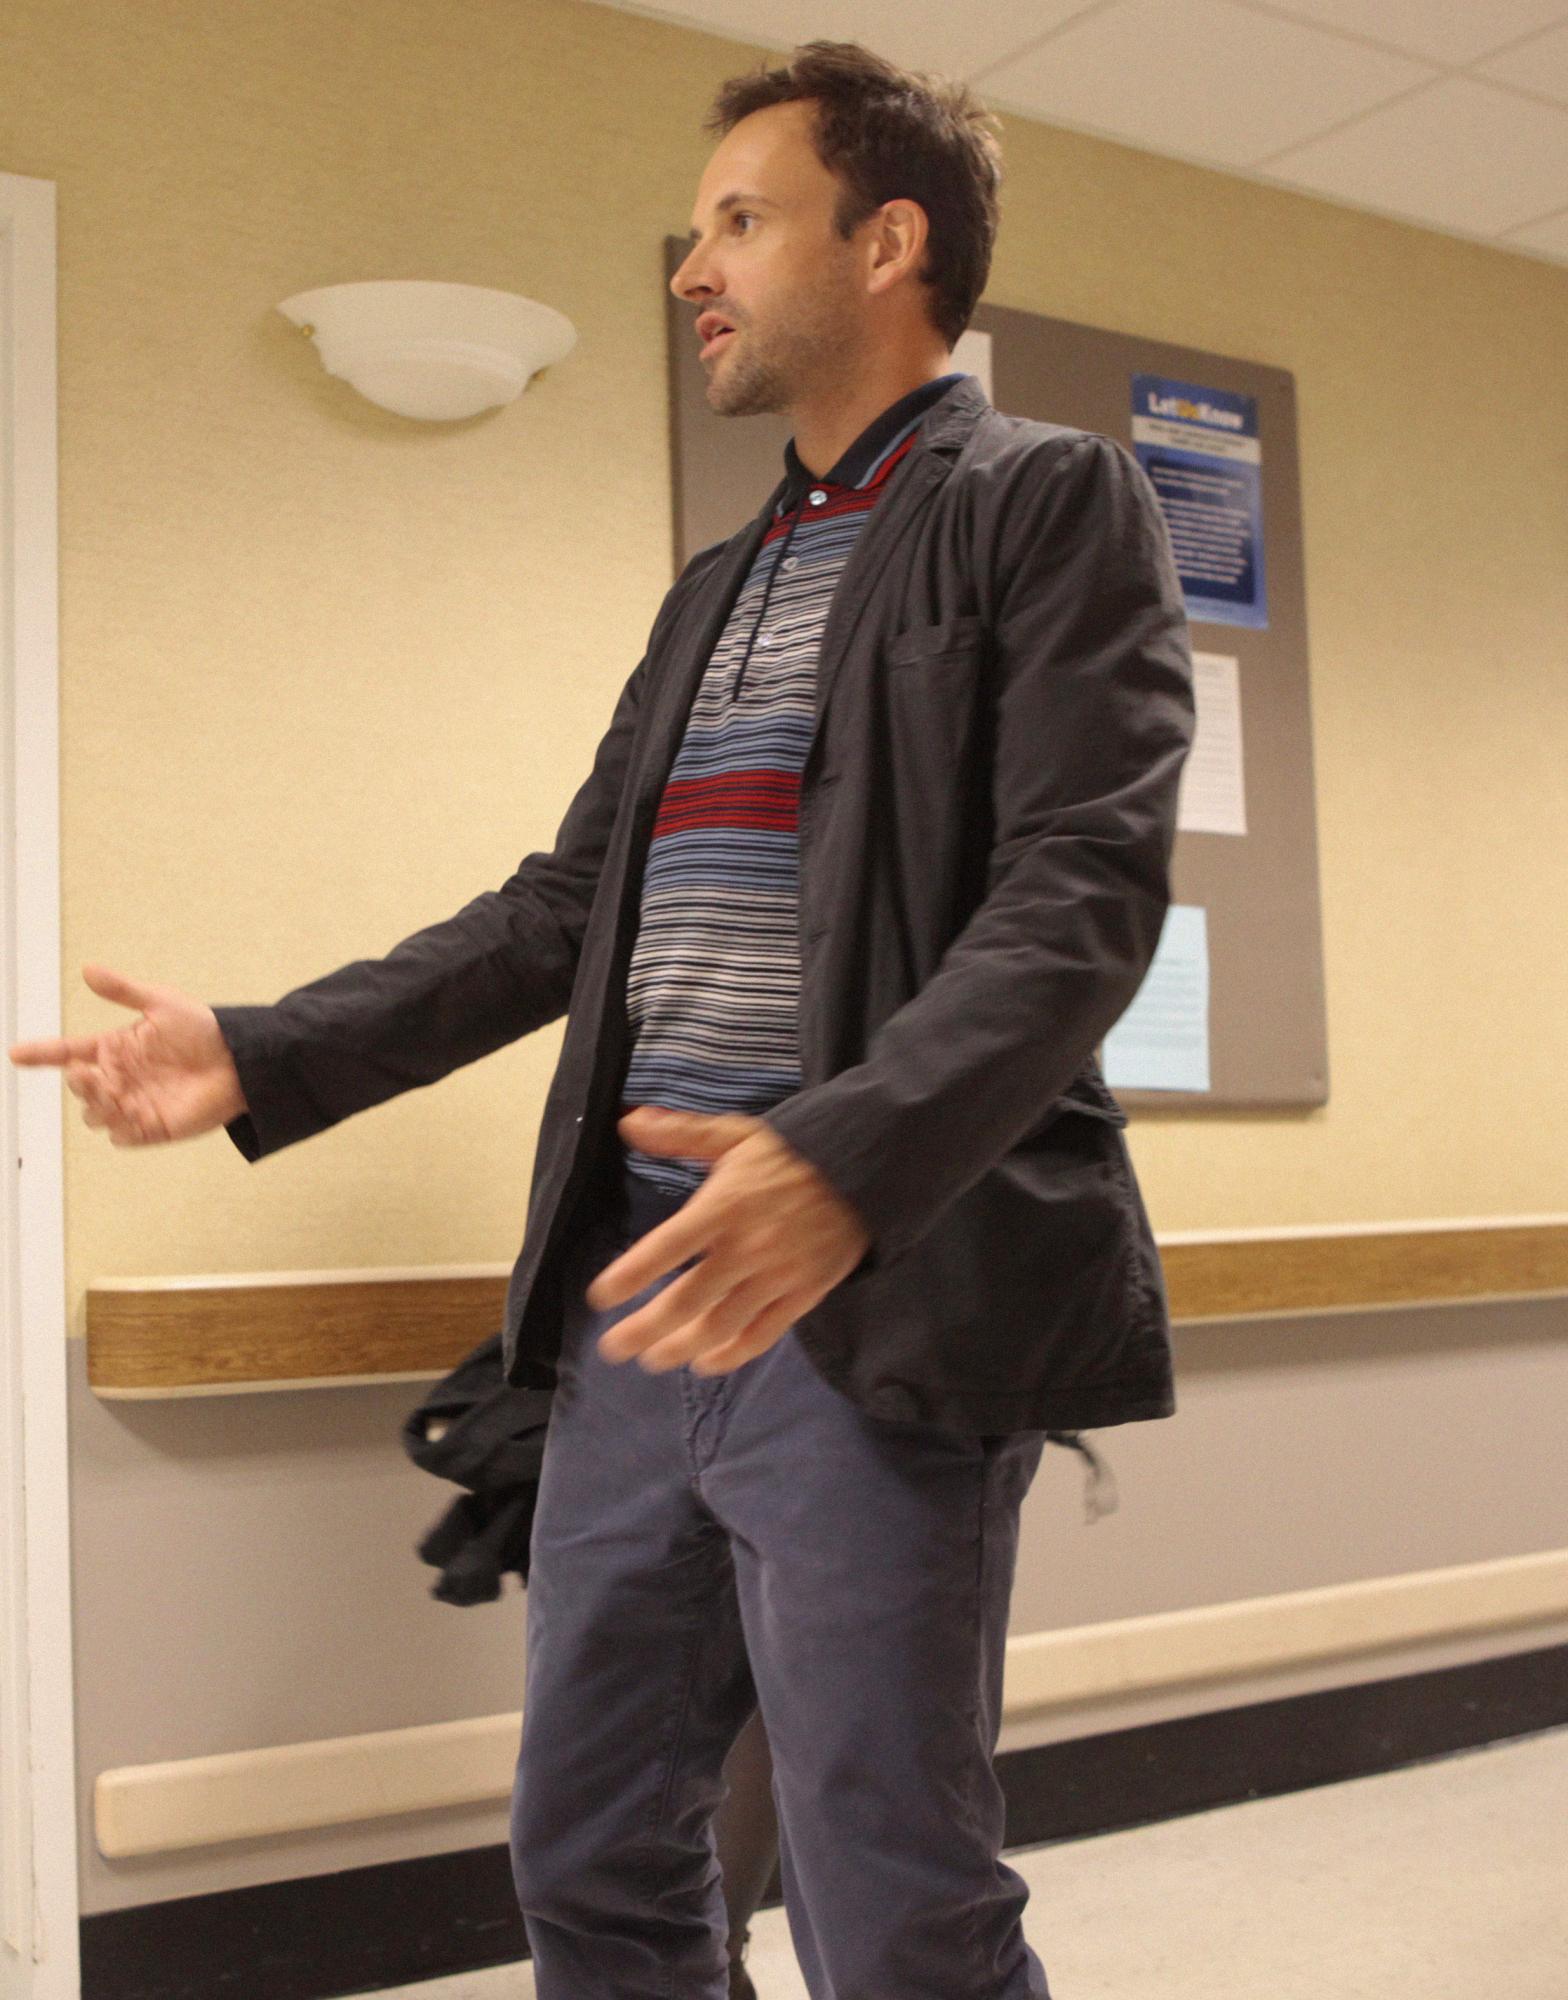 Sherlock Visits the Hospital